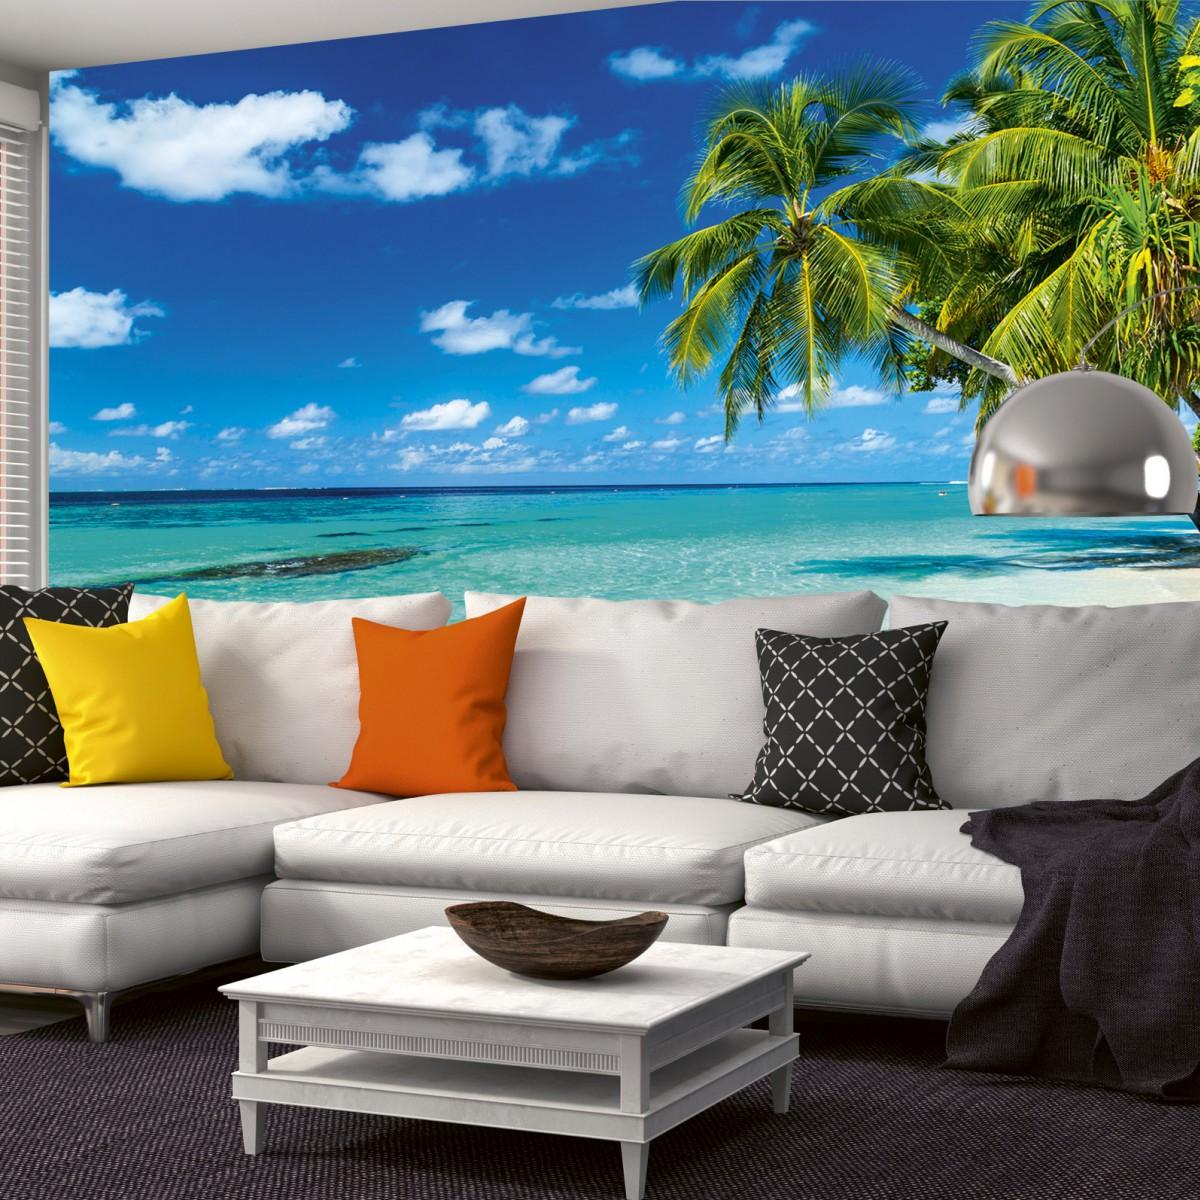 Foto tapet 3D Paradise Beach, Dimex, 5 fâșii, 375 x 250cm